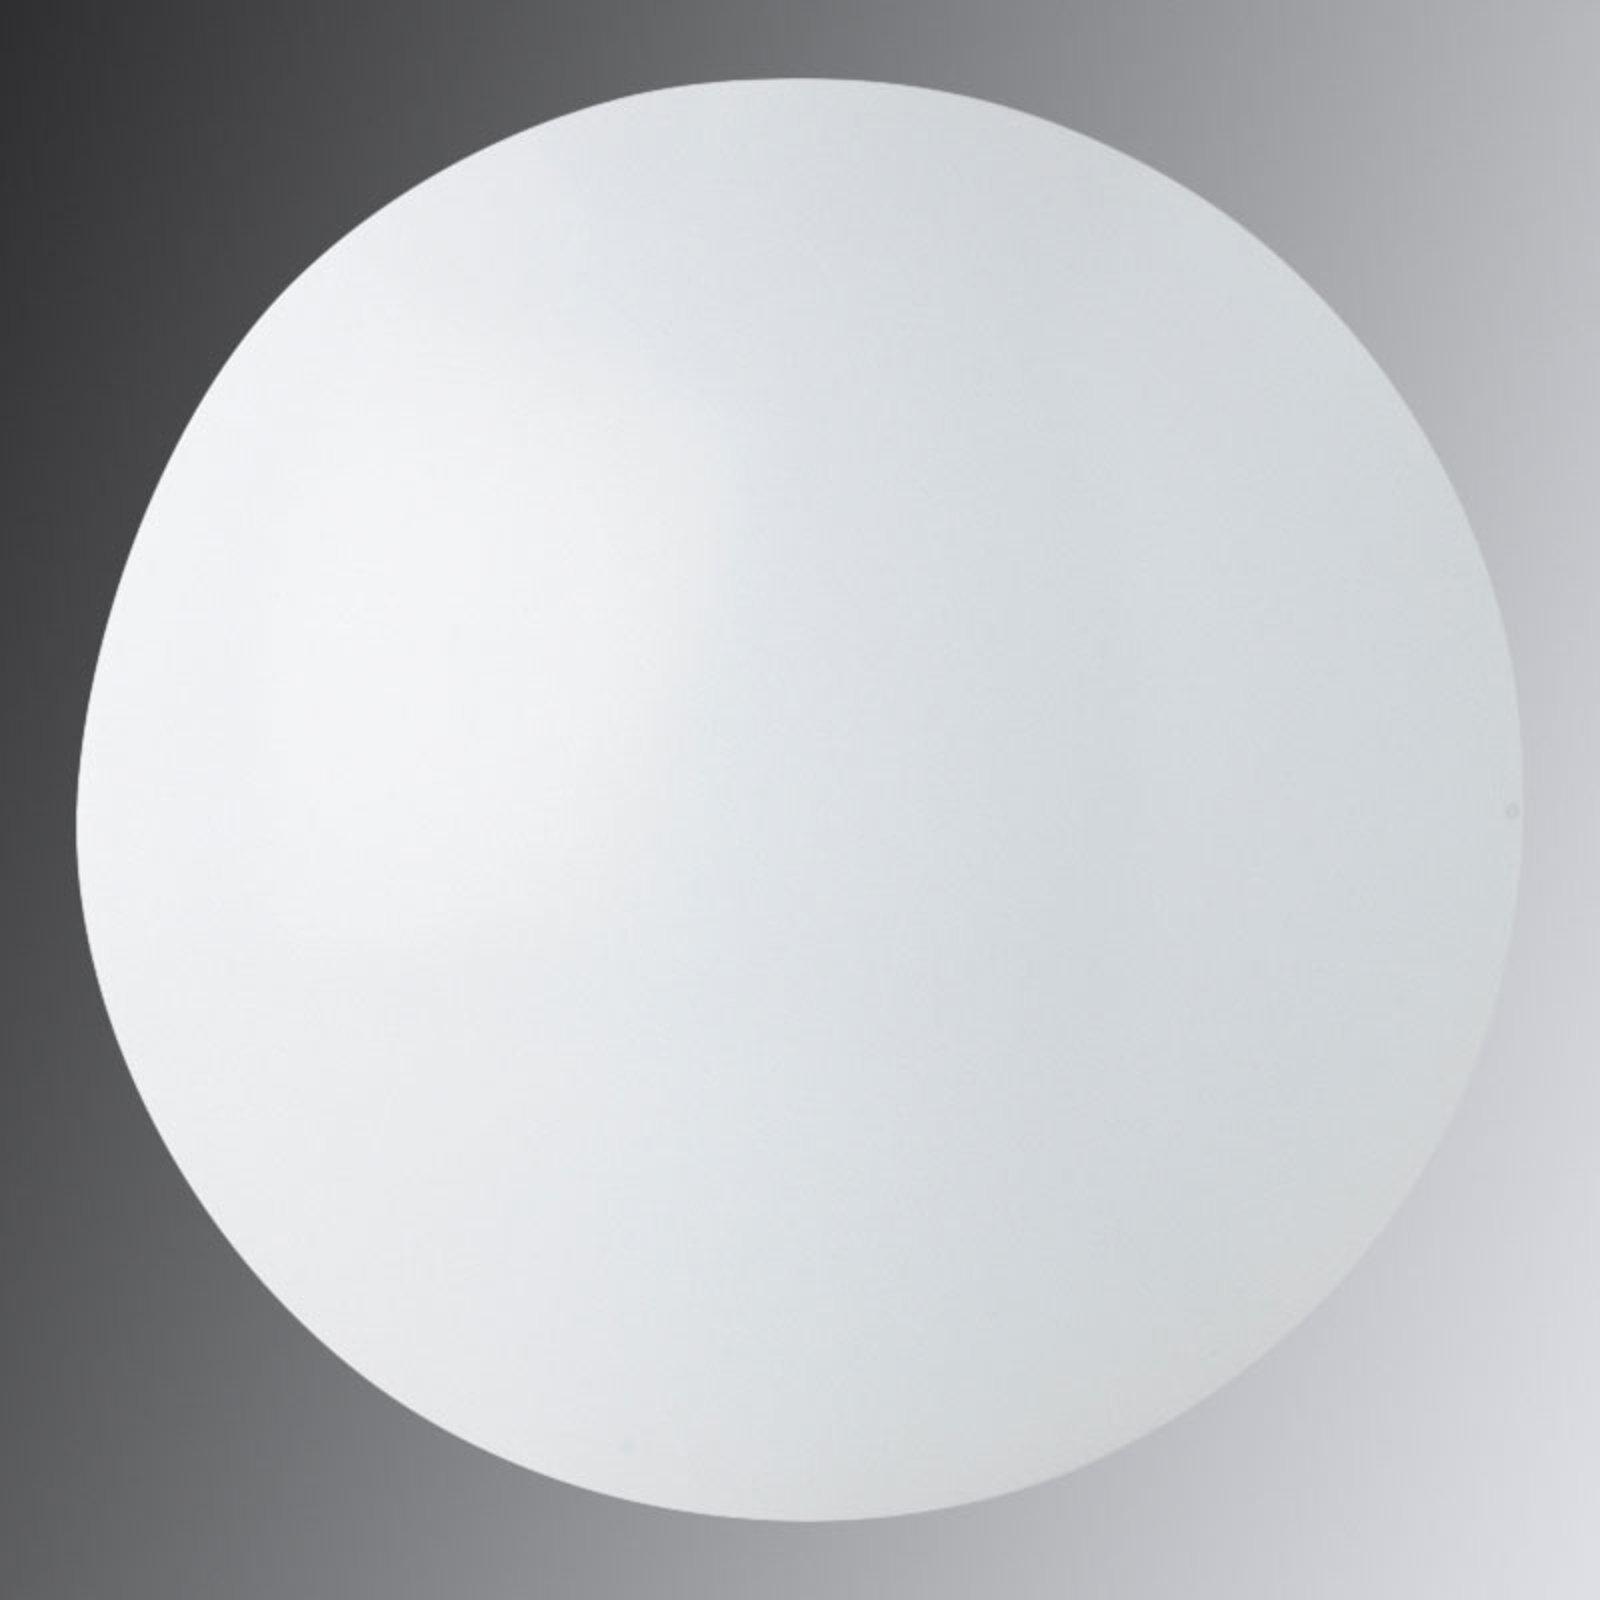 Renzo lys LED-taklampe,31,5 W, 4 000 K